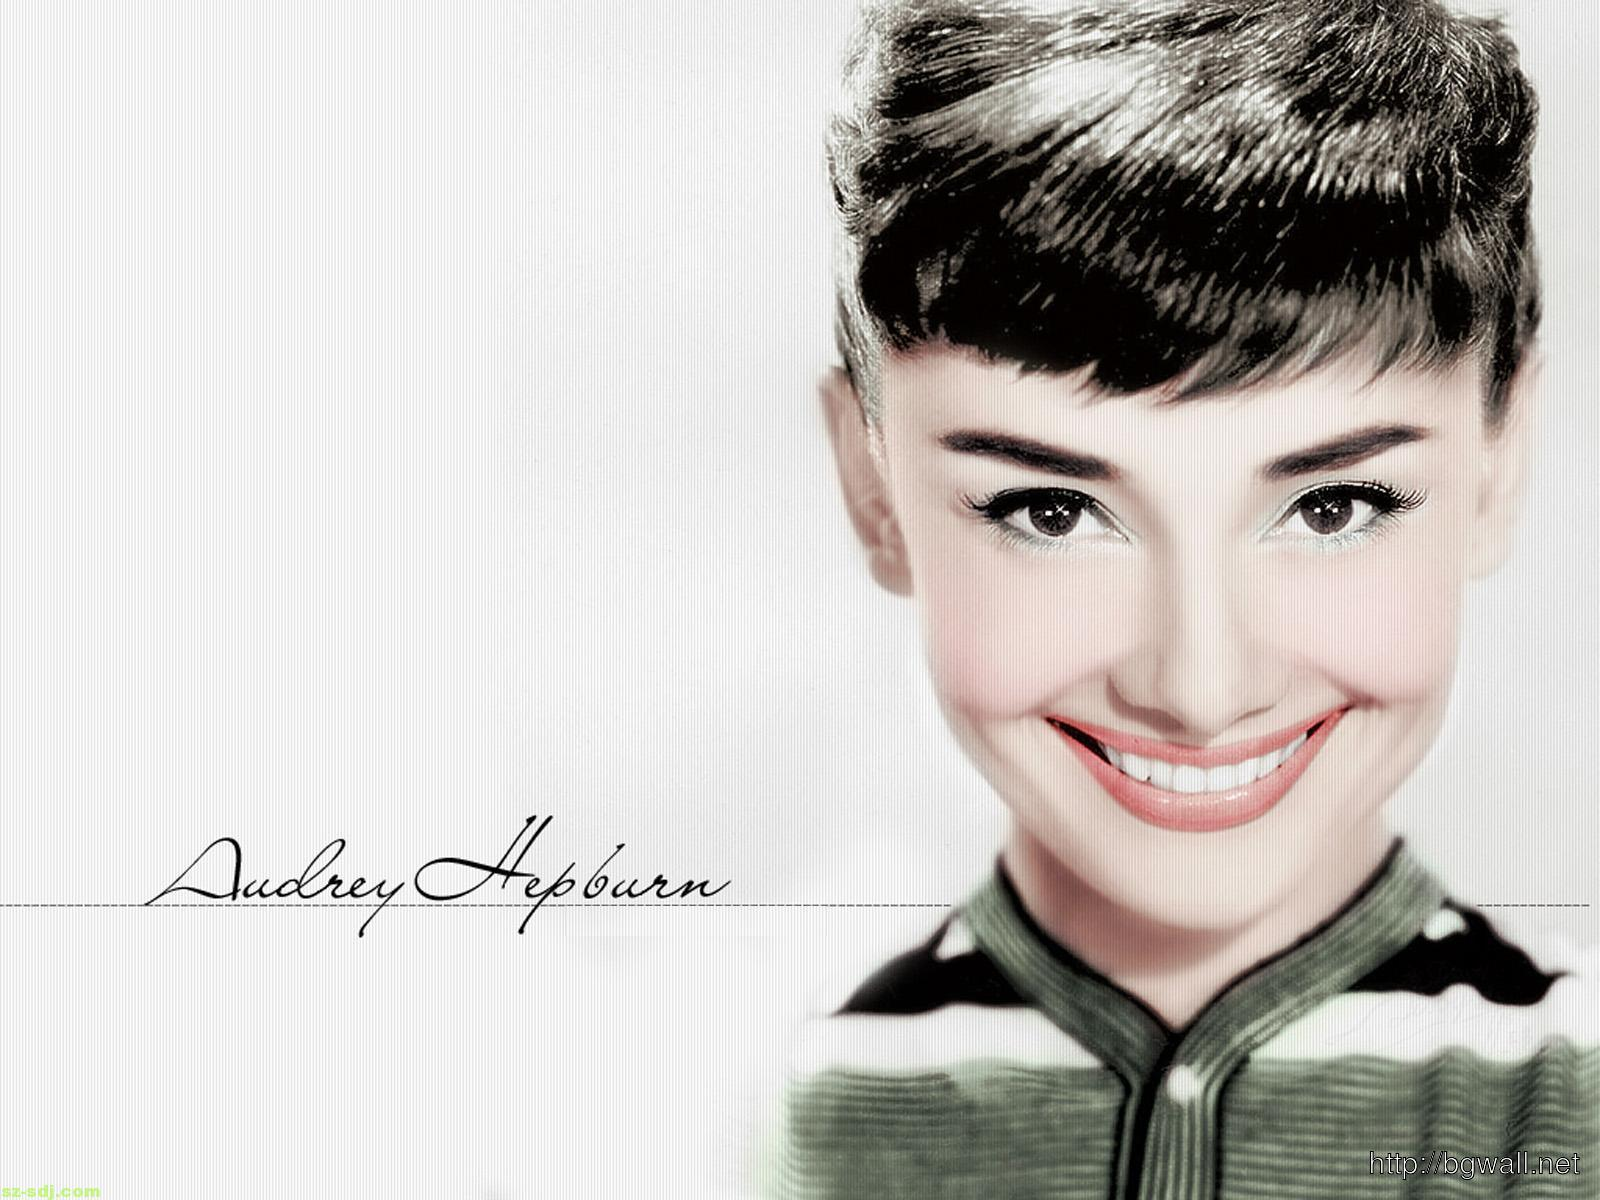 audrey-hepburn-nice-smile-wallpaper-background